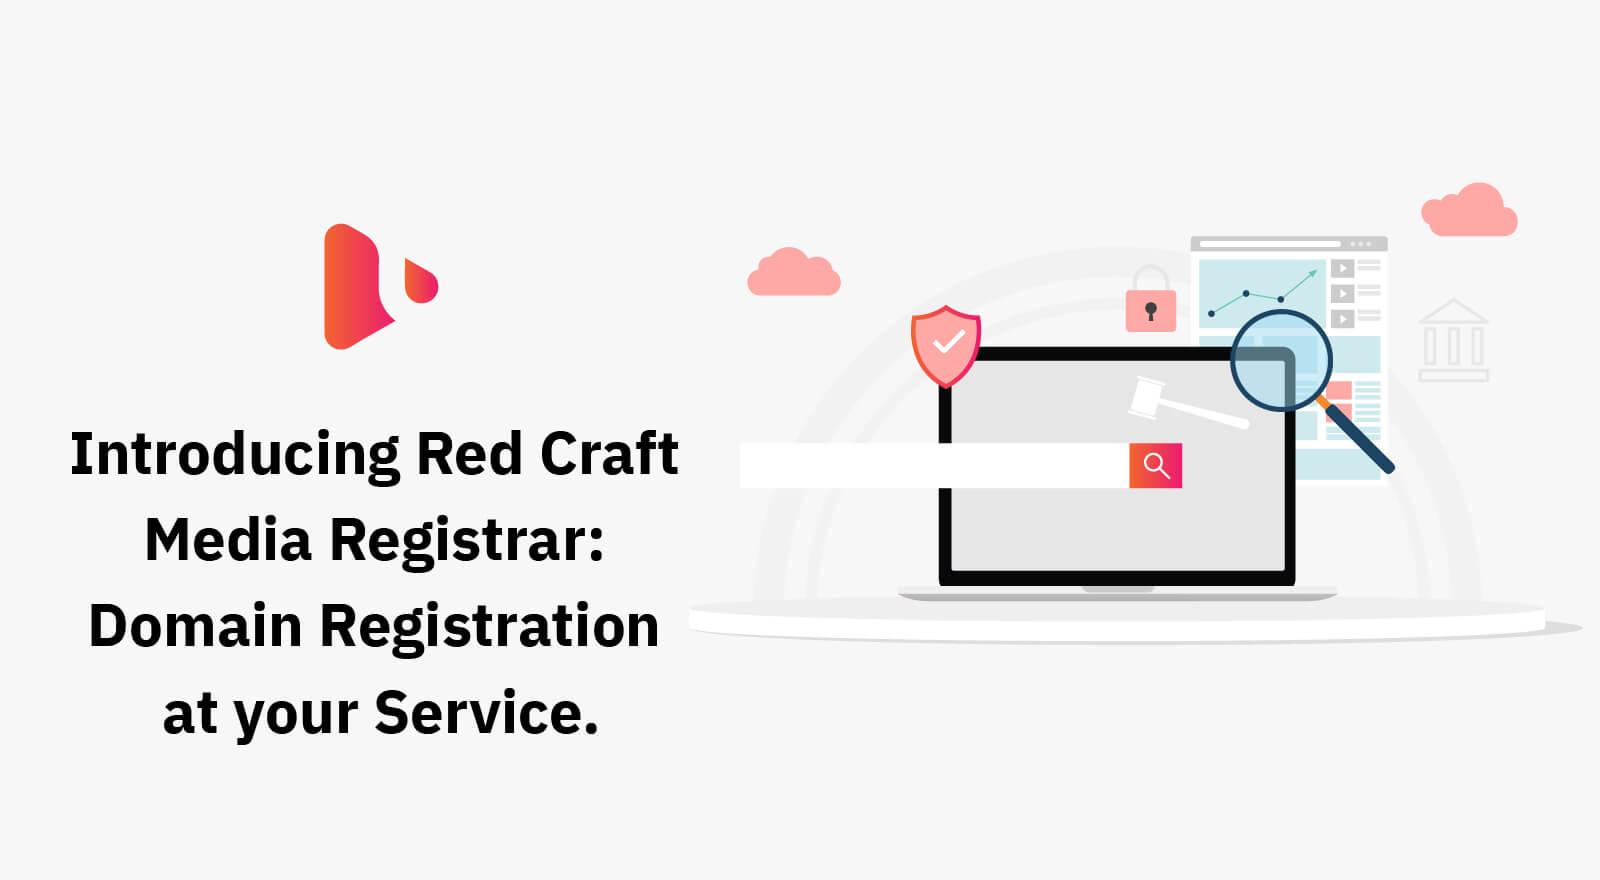 Introducing Red Craft Media Registrar Domain Registration Services